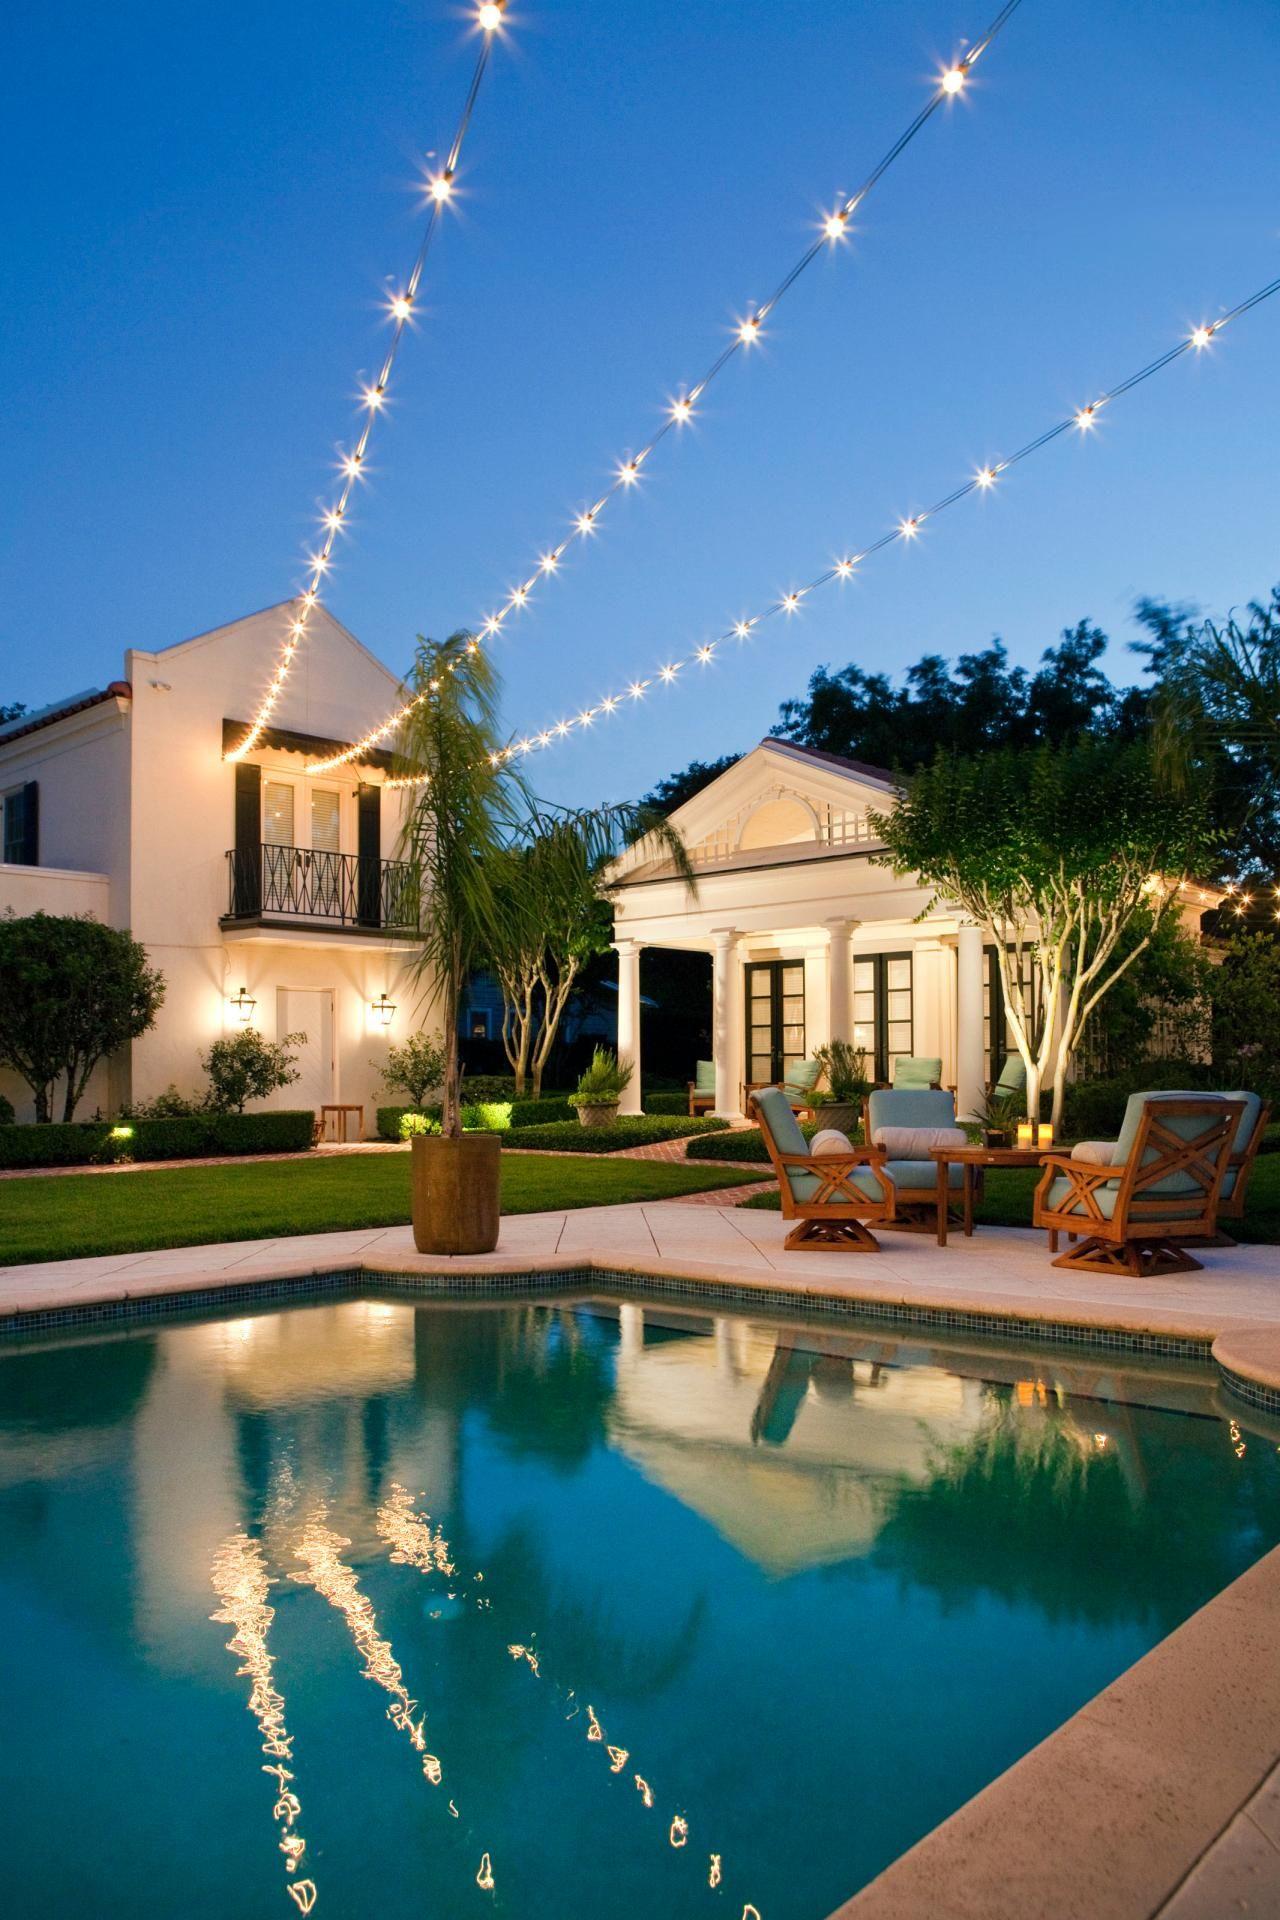 Pin On Home Patio Garden Style